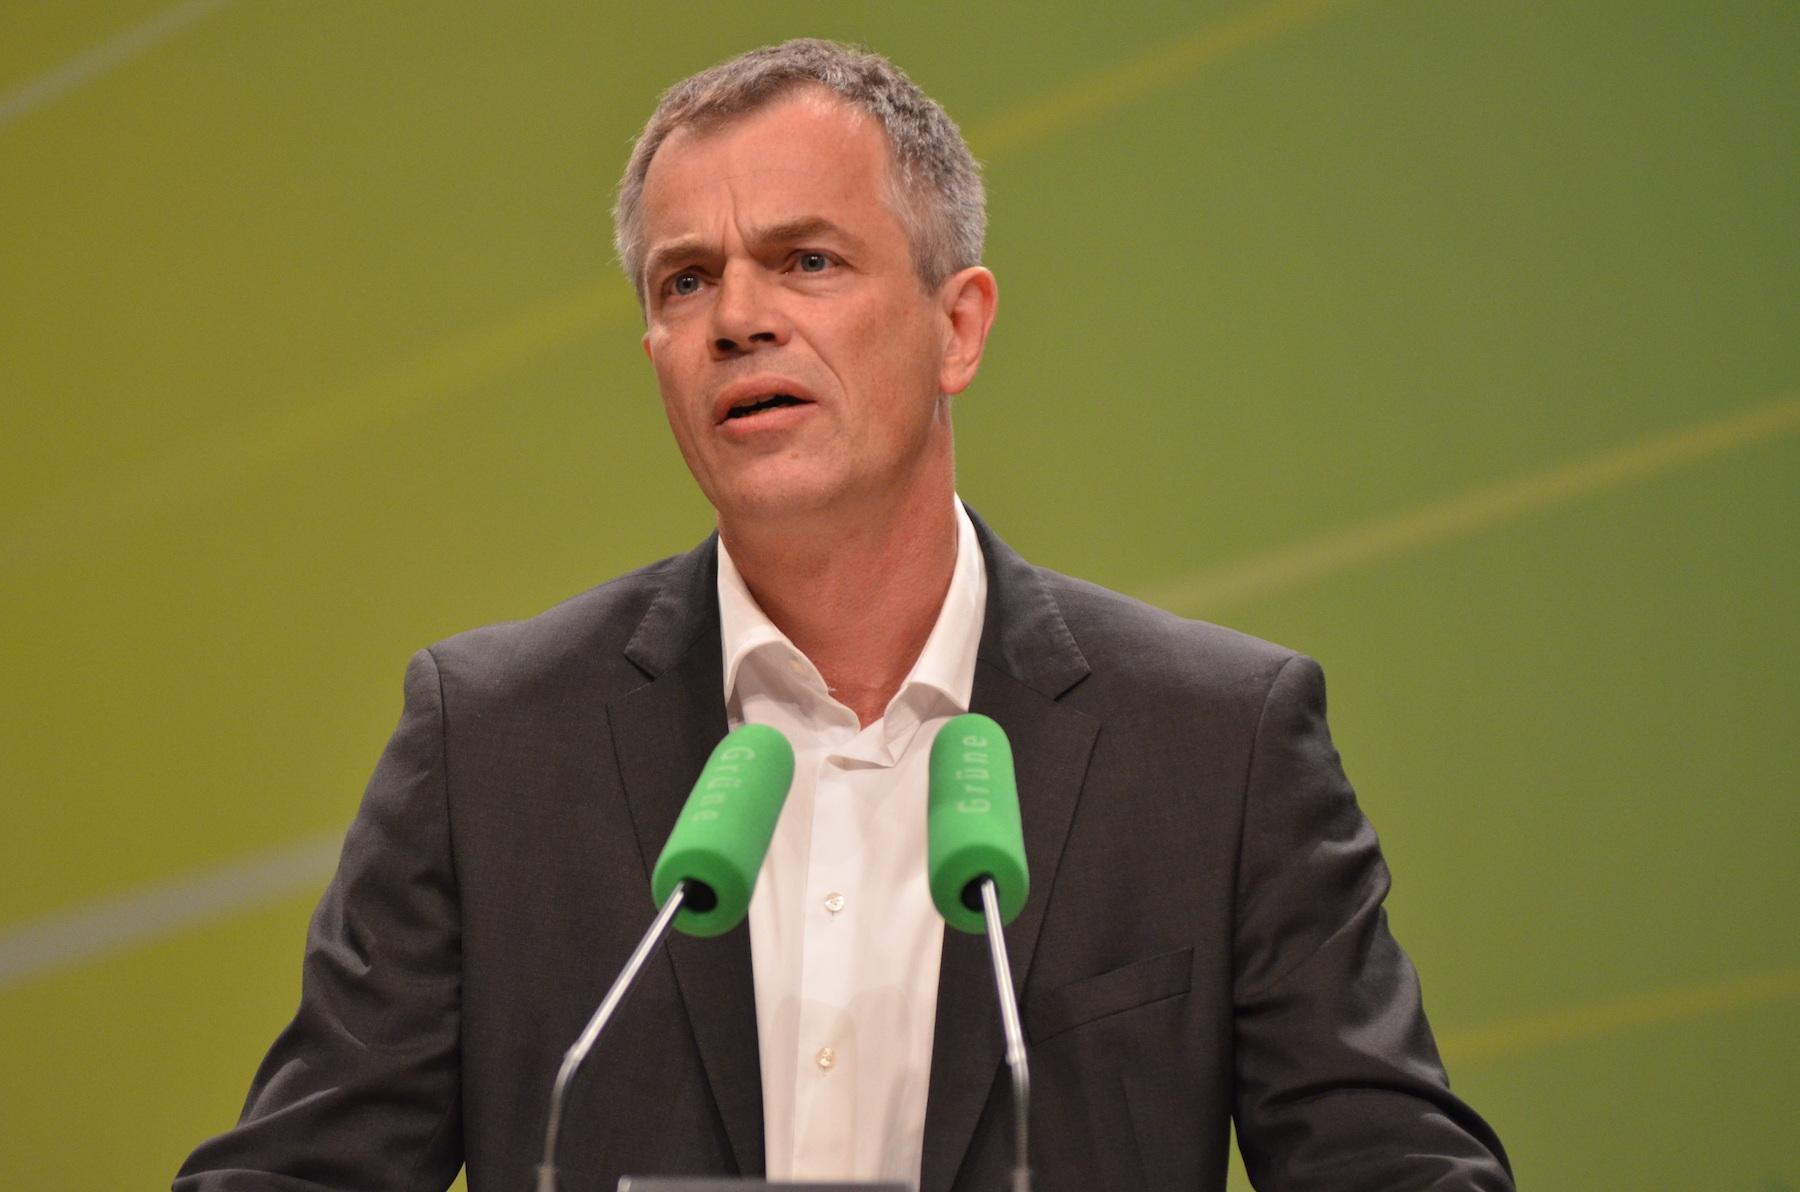 Foto: Bündnis 90 die Grünen / wikipedia.org